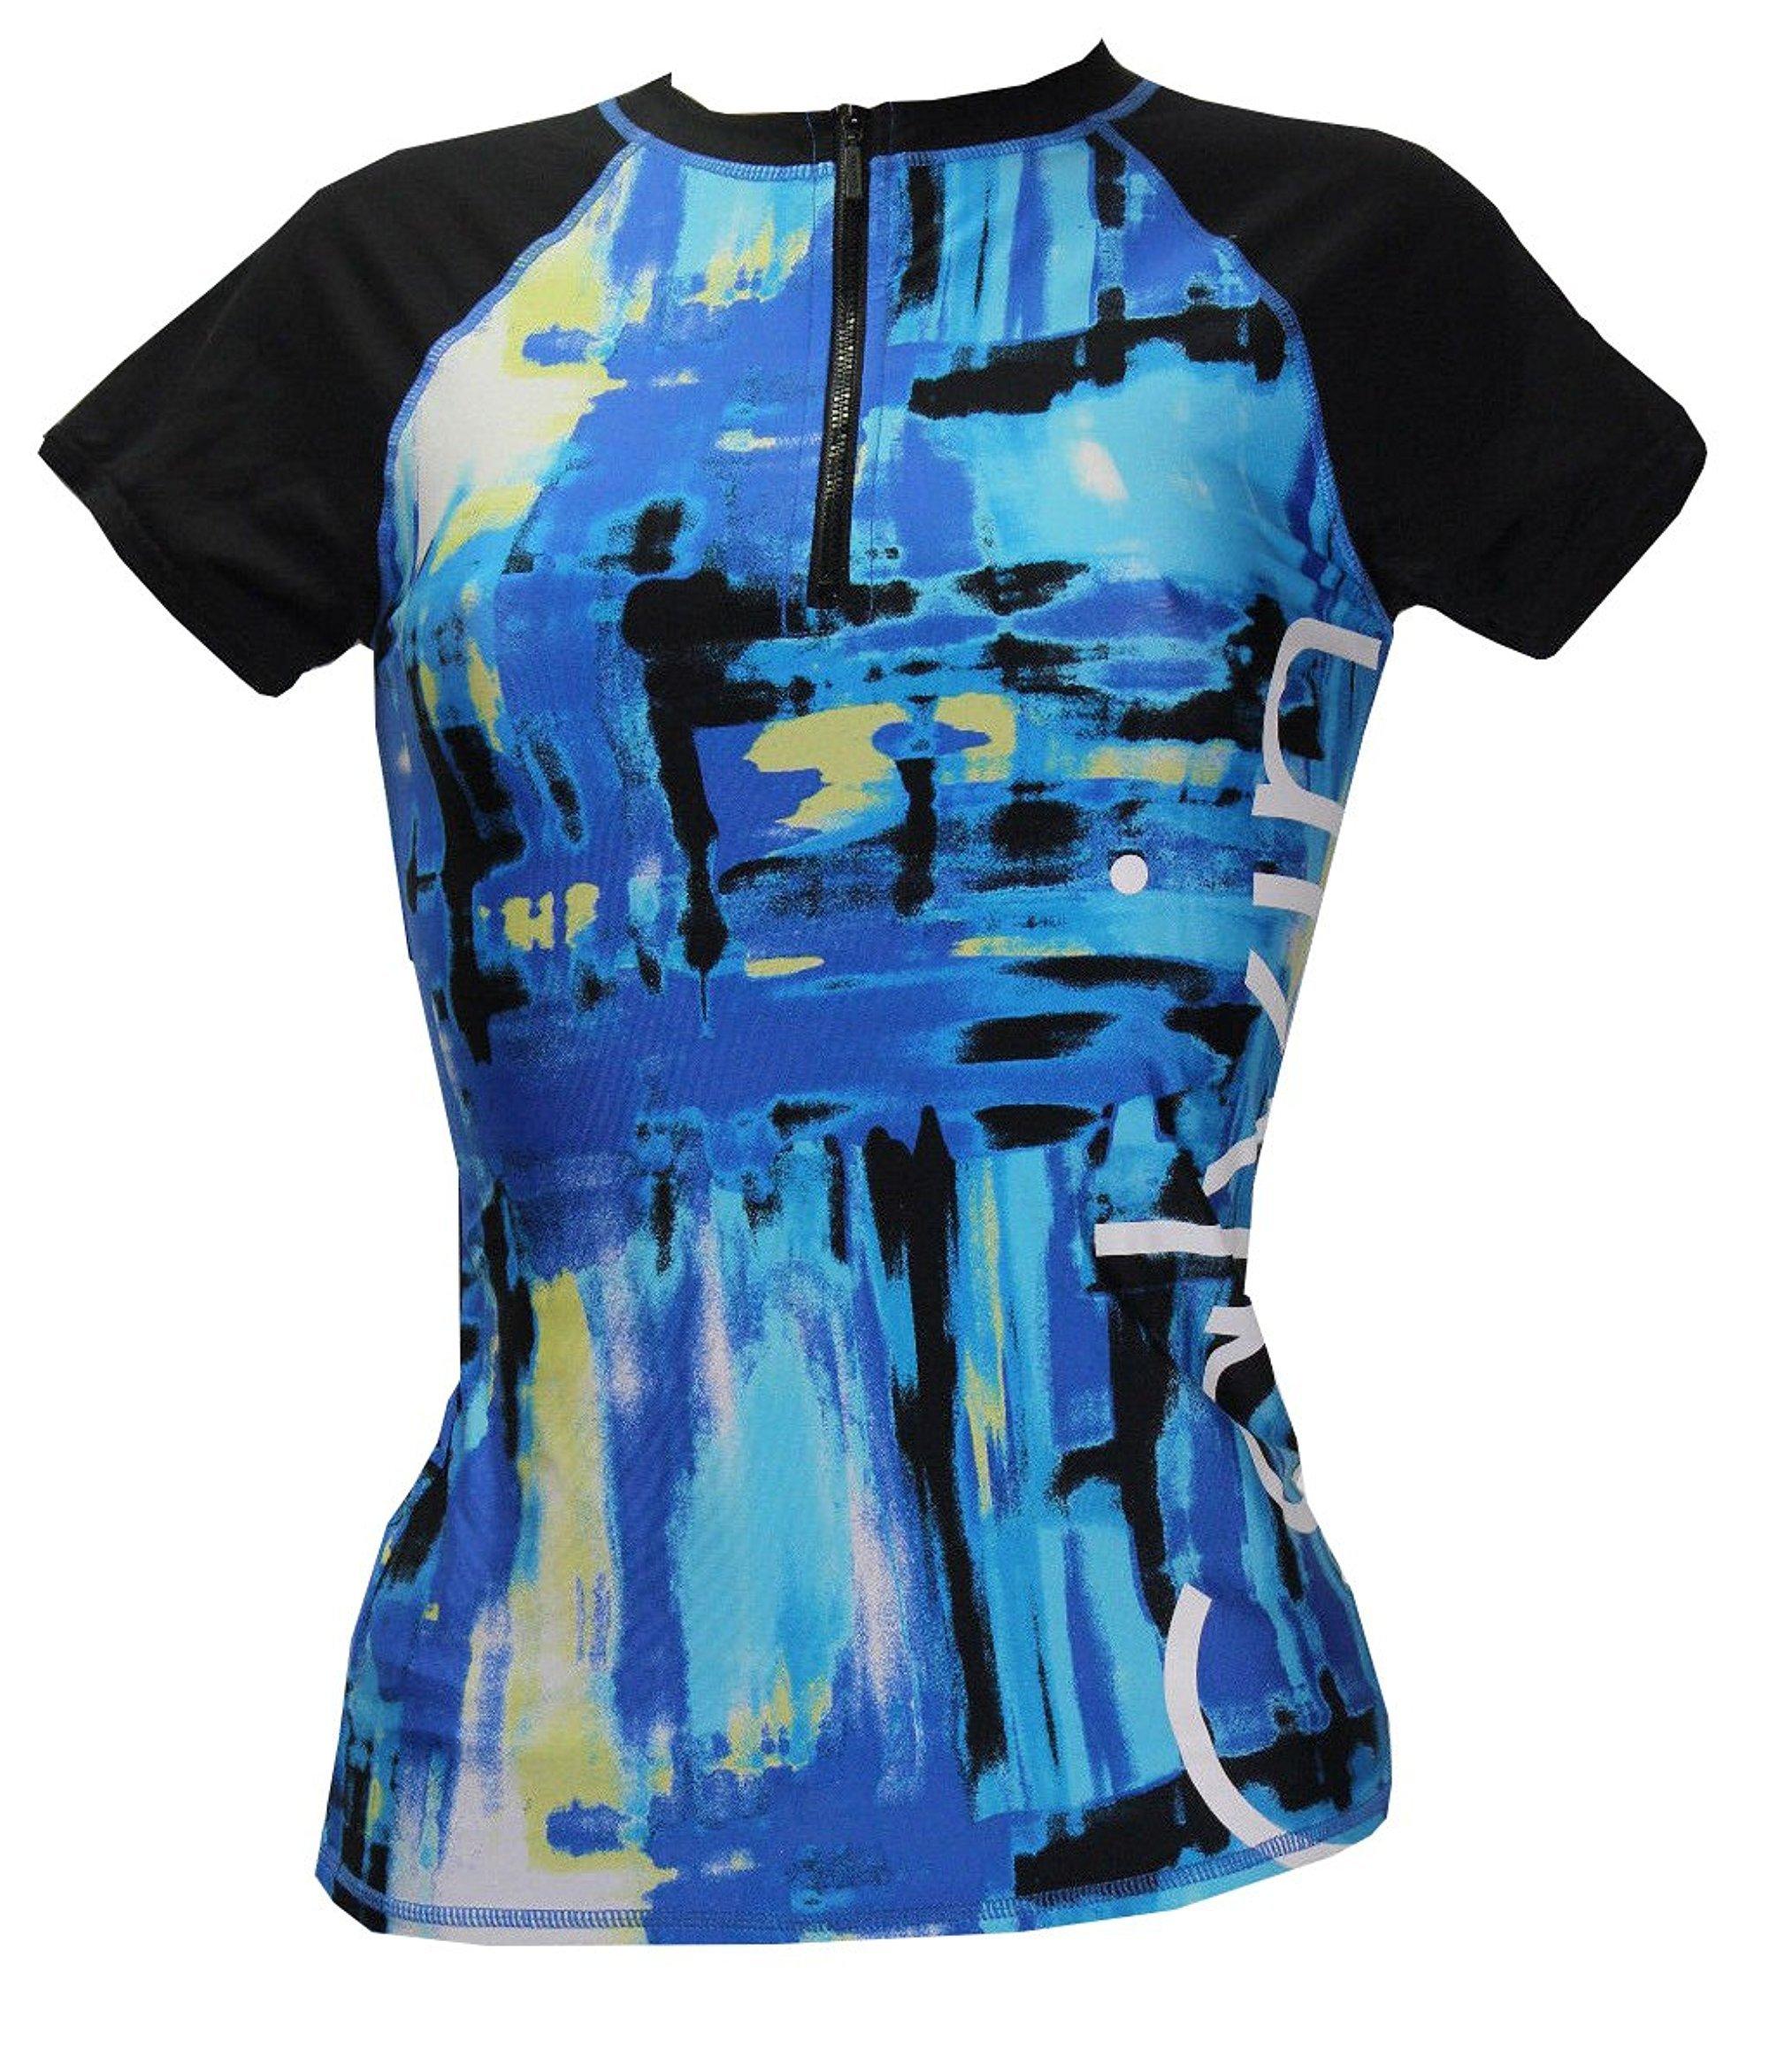 Calvin Klein Women's Short-Sleeve Rashguard (Cyan/Navy, Large)